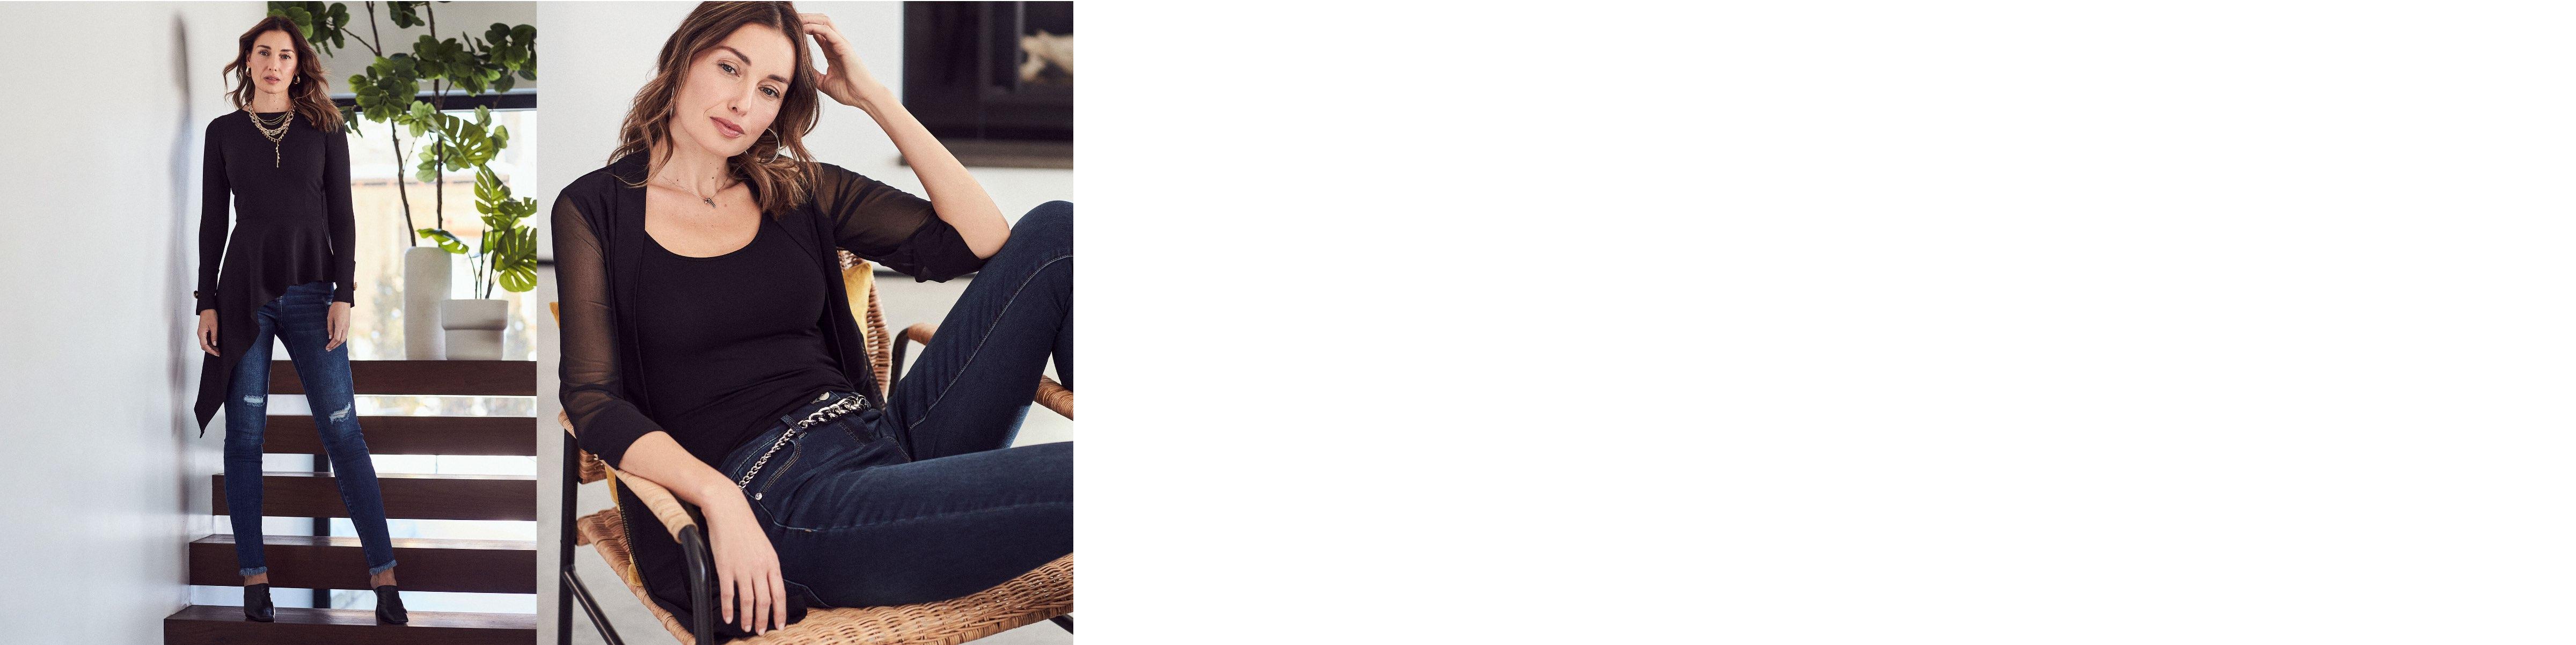 Melanie Lyne - Clothing